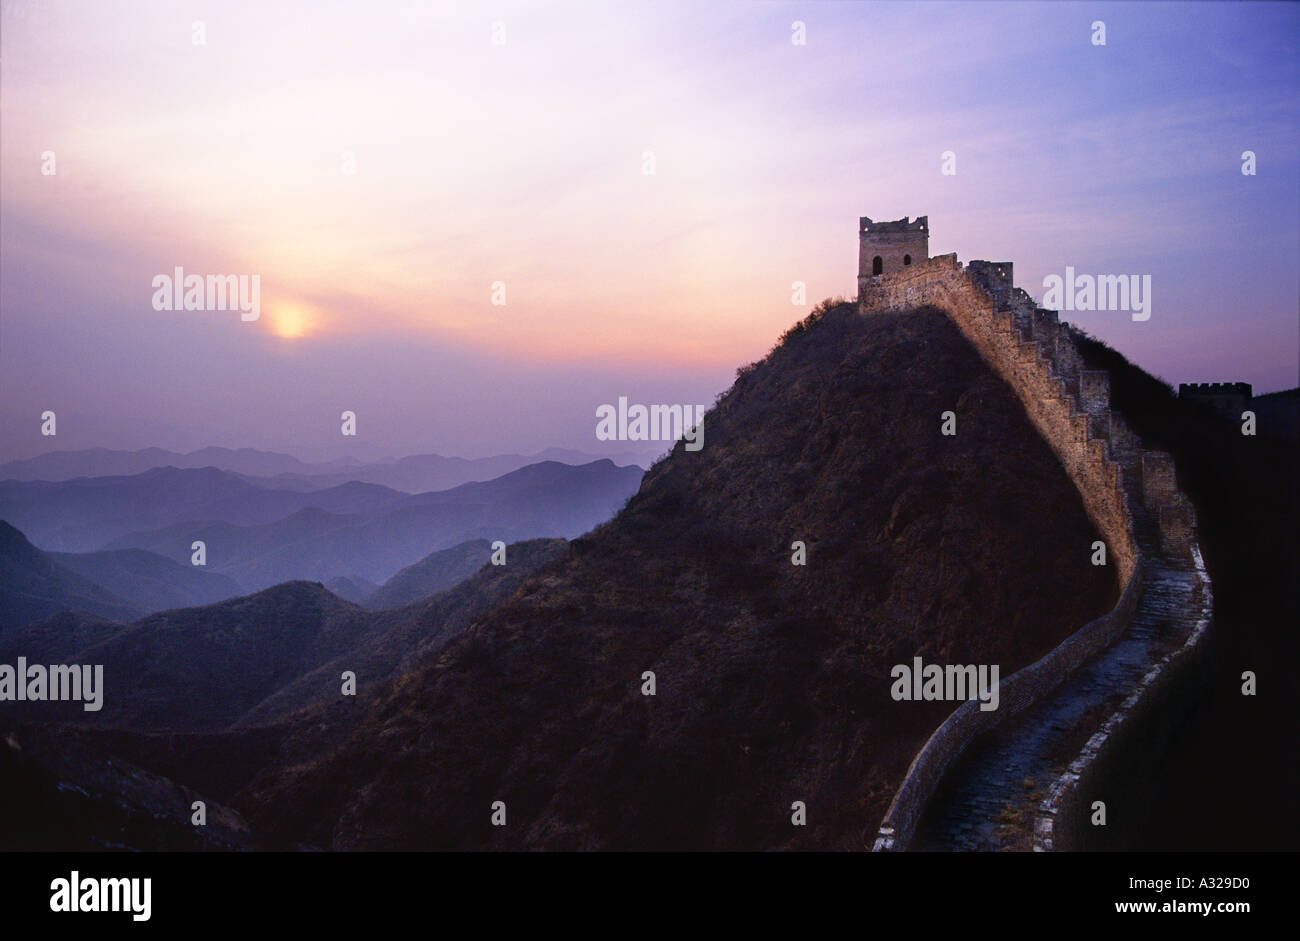 La Grande Muraille de Chine près de Pékin Chine Photo Stock